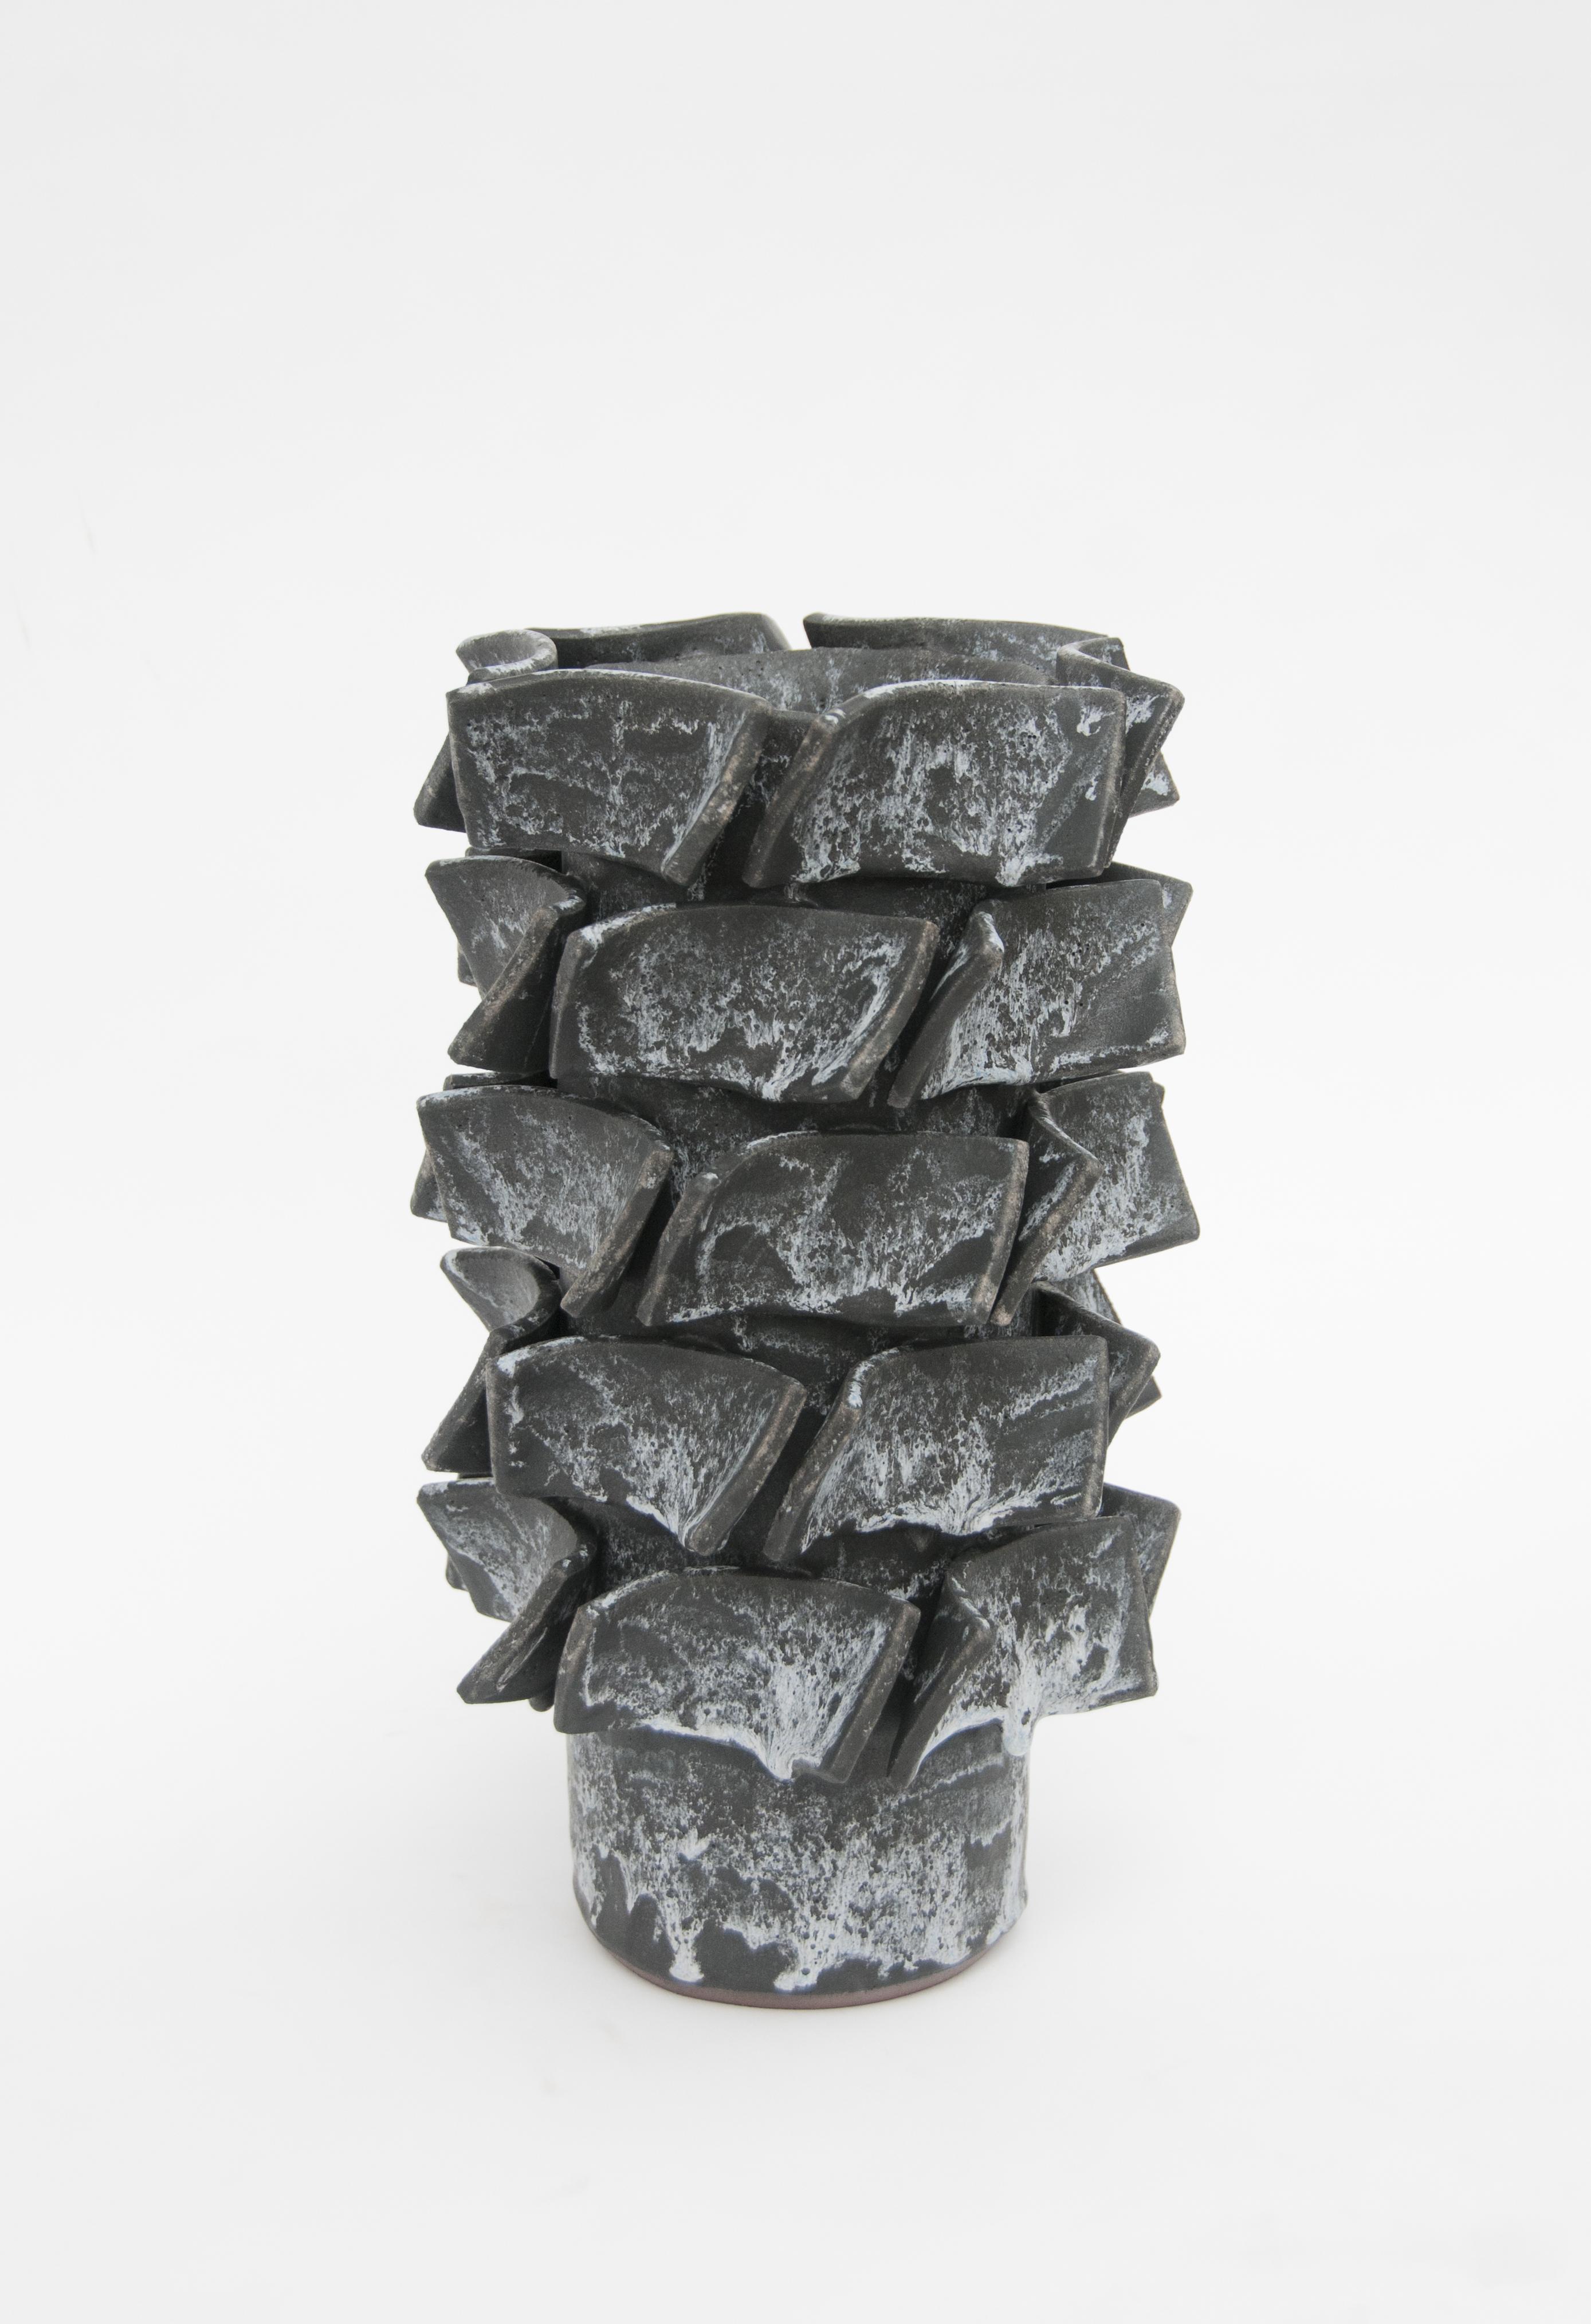 Ben Medansky, Wrap & Twist III, 2021